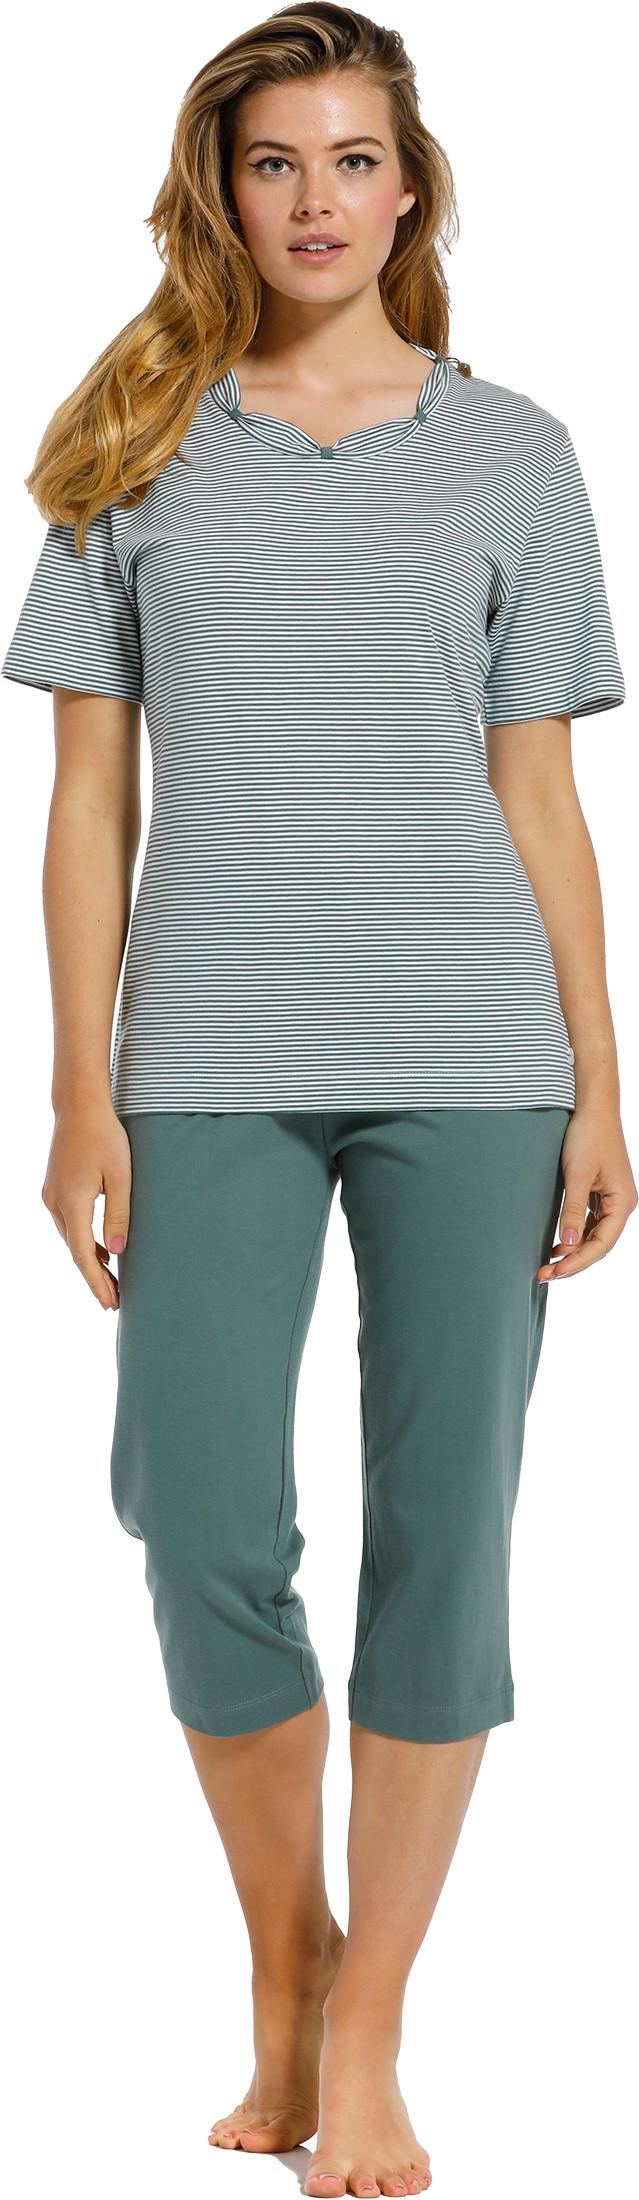 Dames pyjama Pastunette 20211-136-2 -46